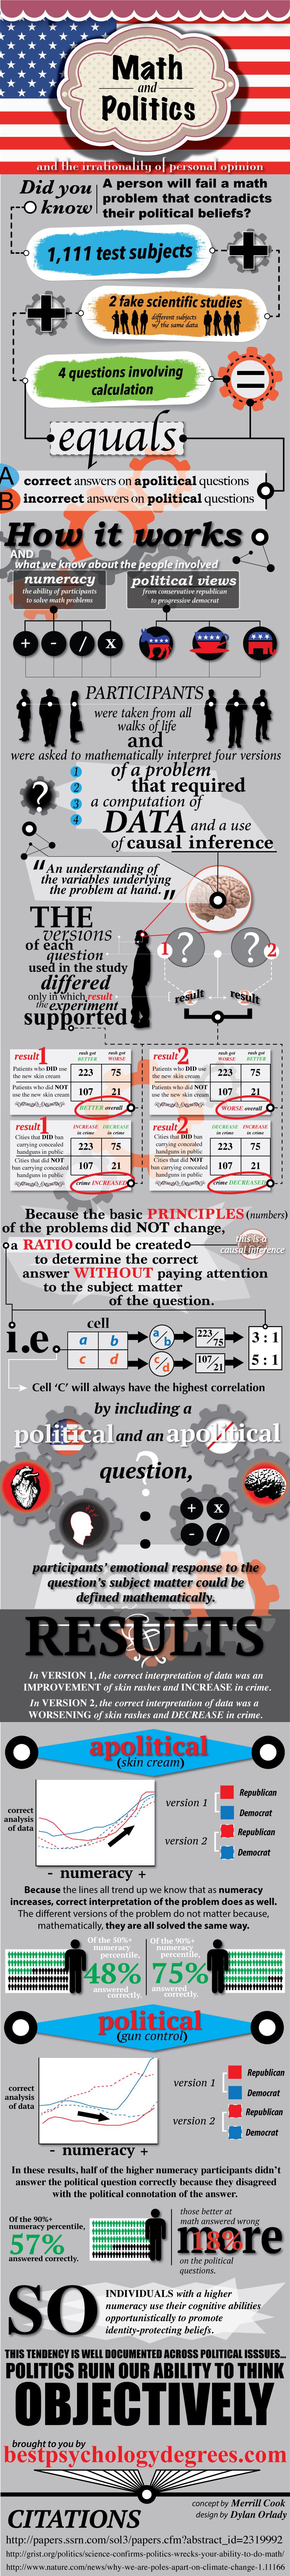 mathpolitics_web_900px